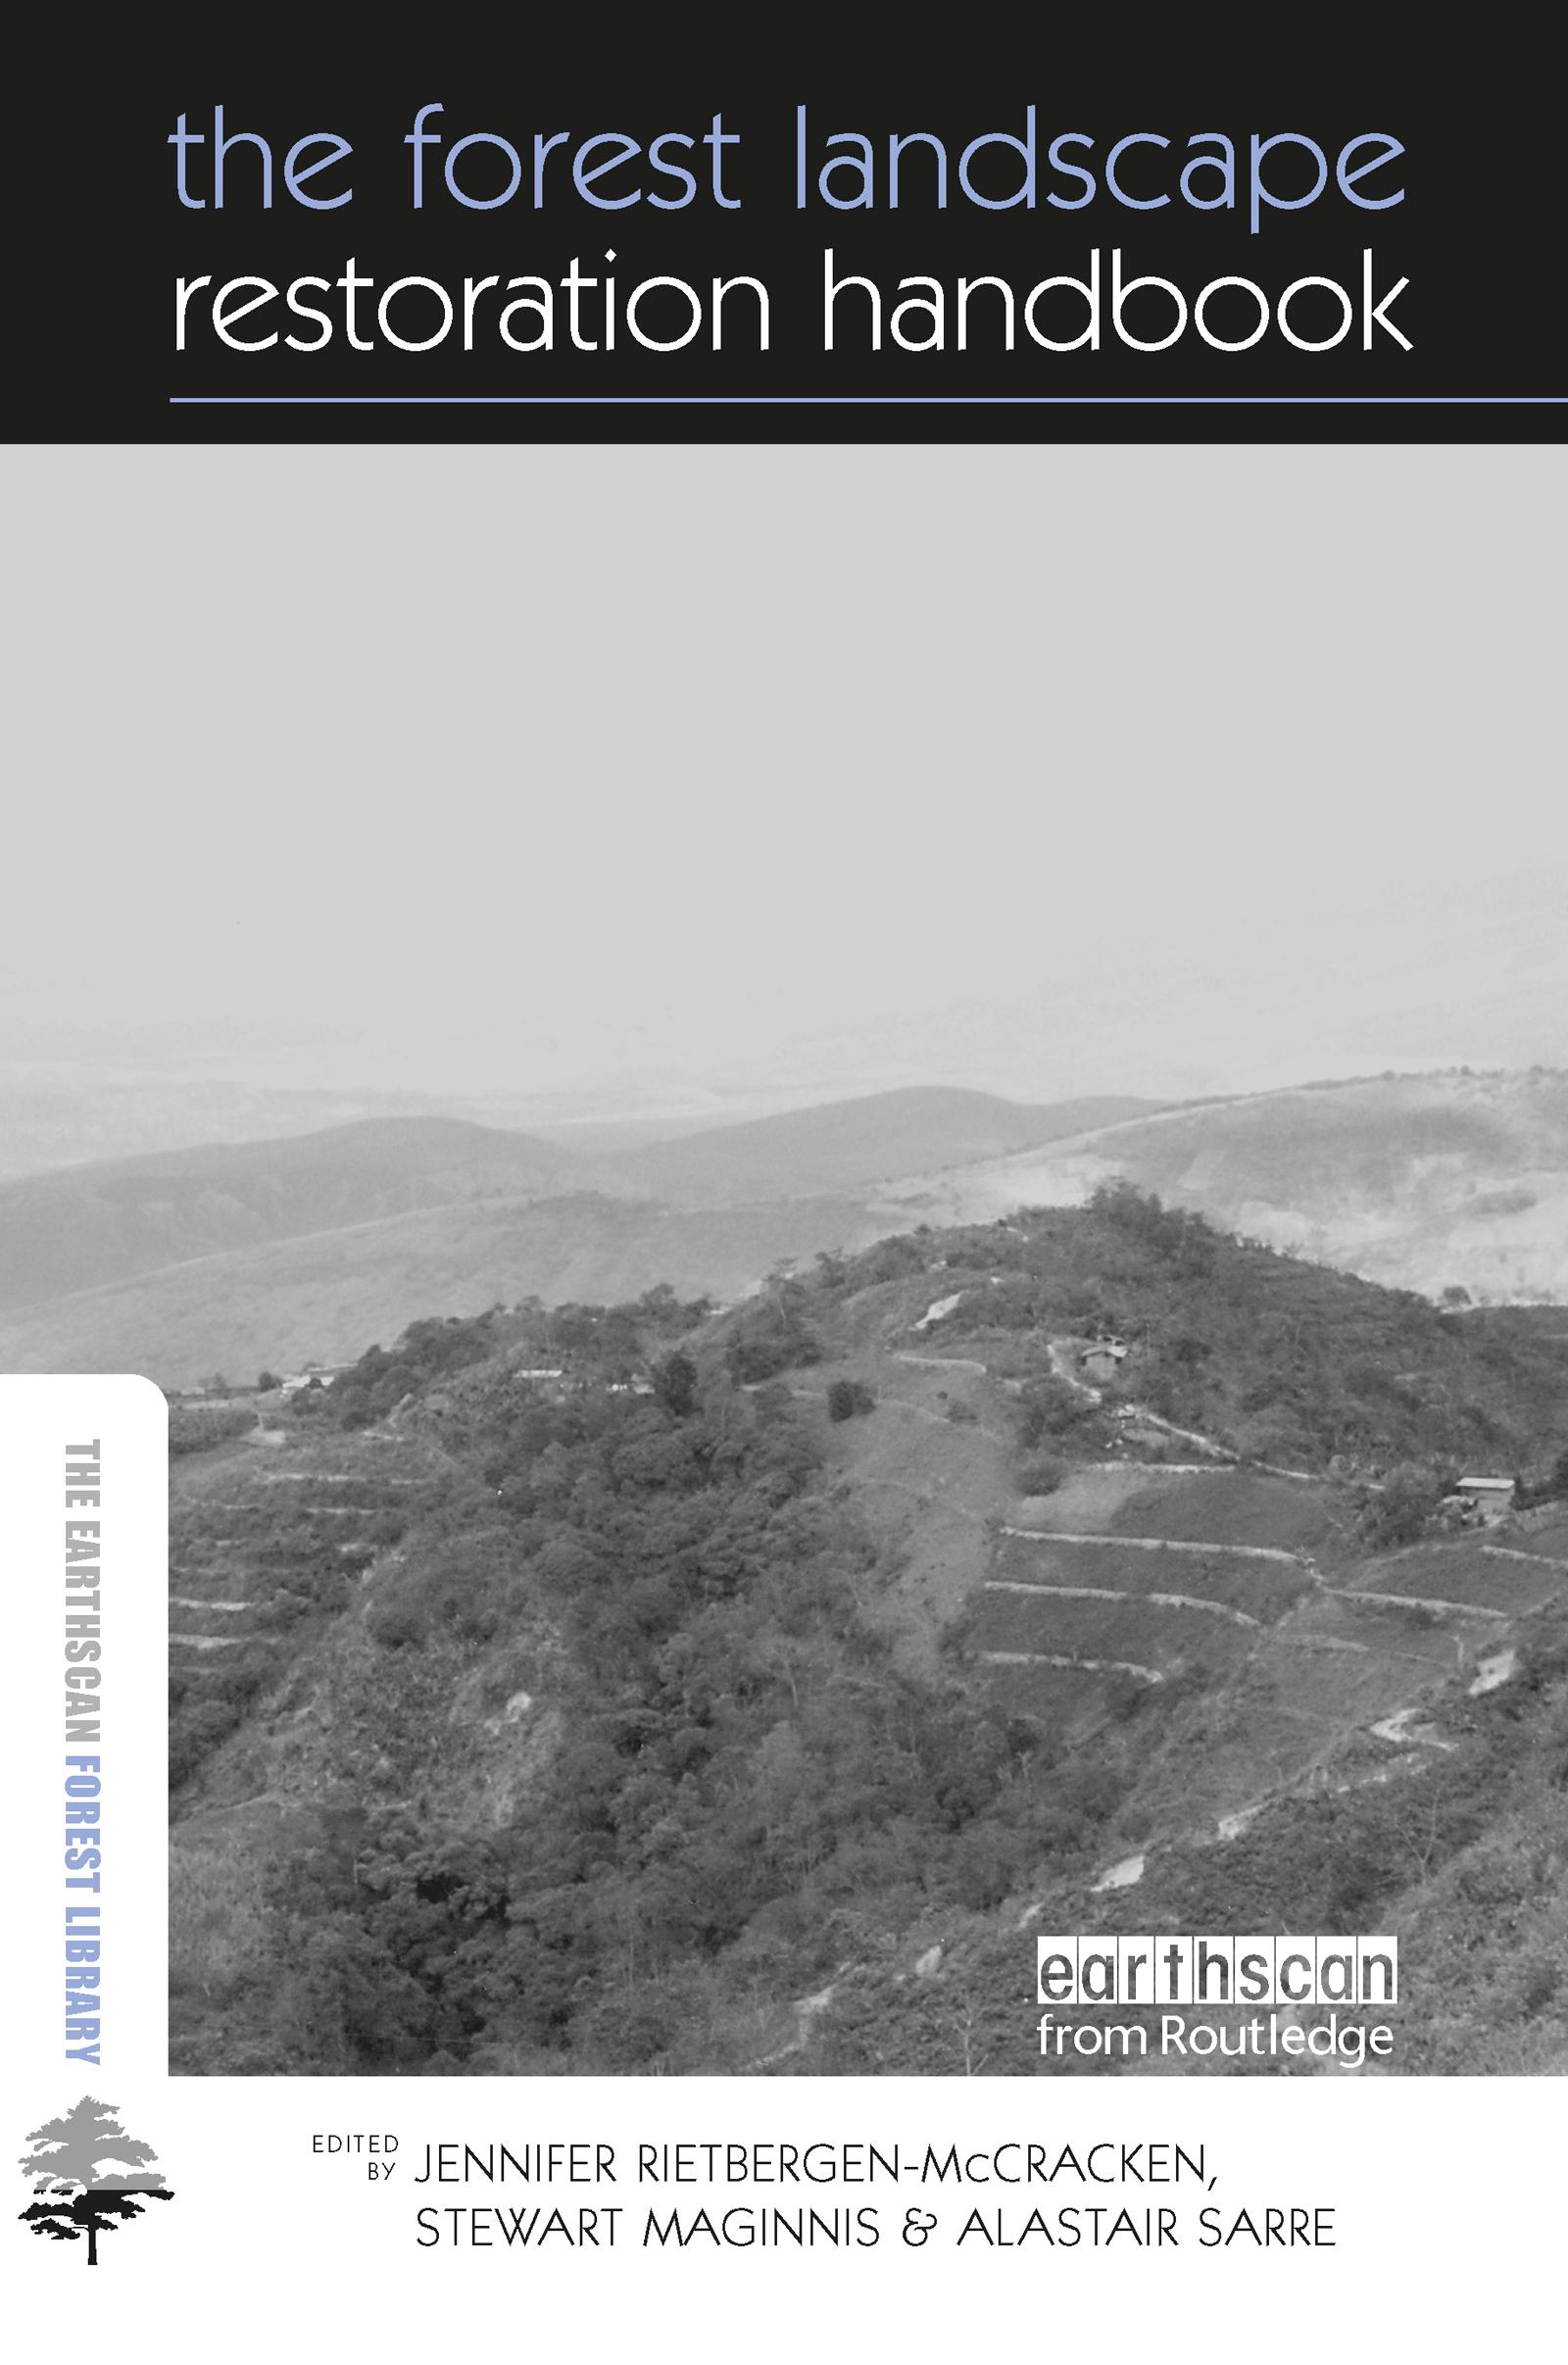 The Forest Landscape Restoration Handbook book cover